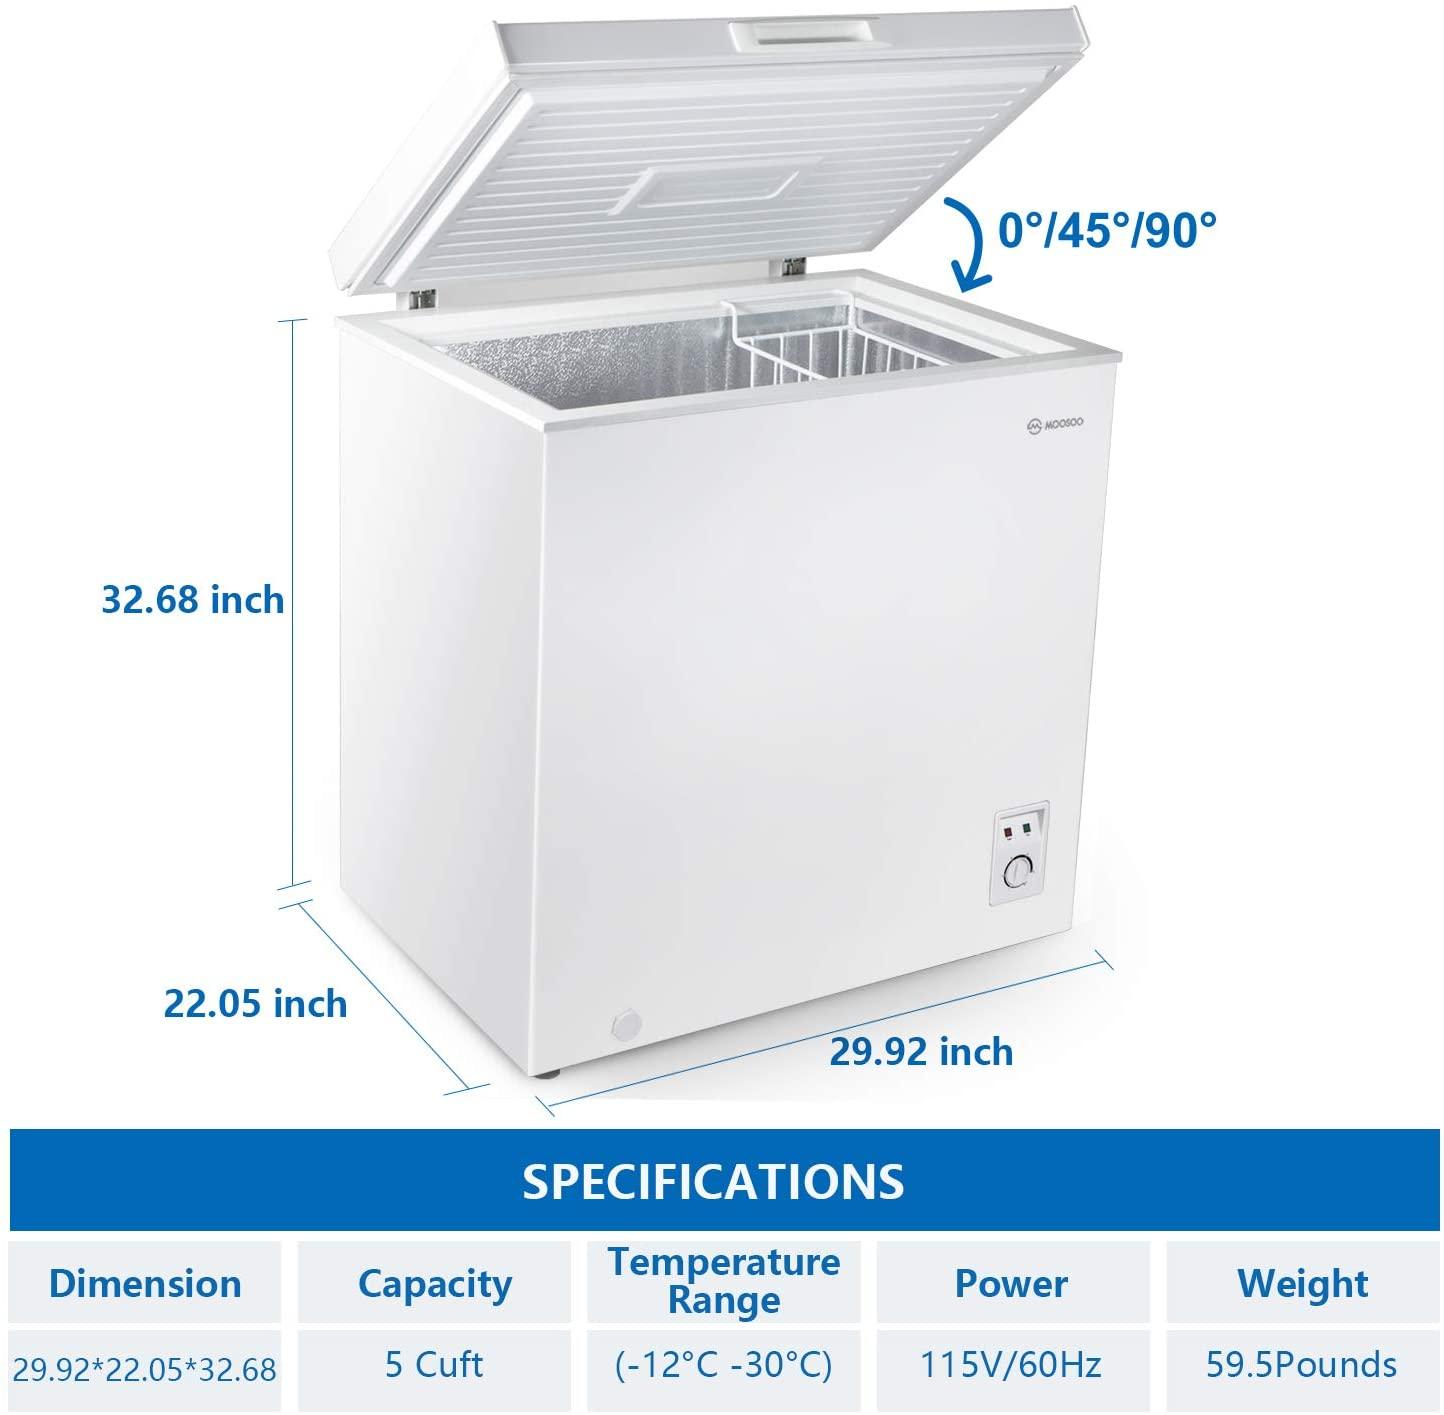 MOOSOO Chest Freezer, 5.0 Cubic Feet Deep Freezer Specs